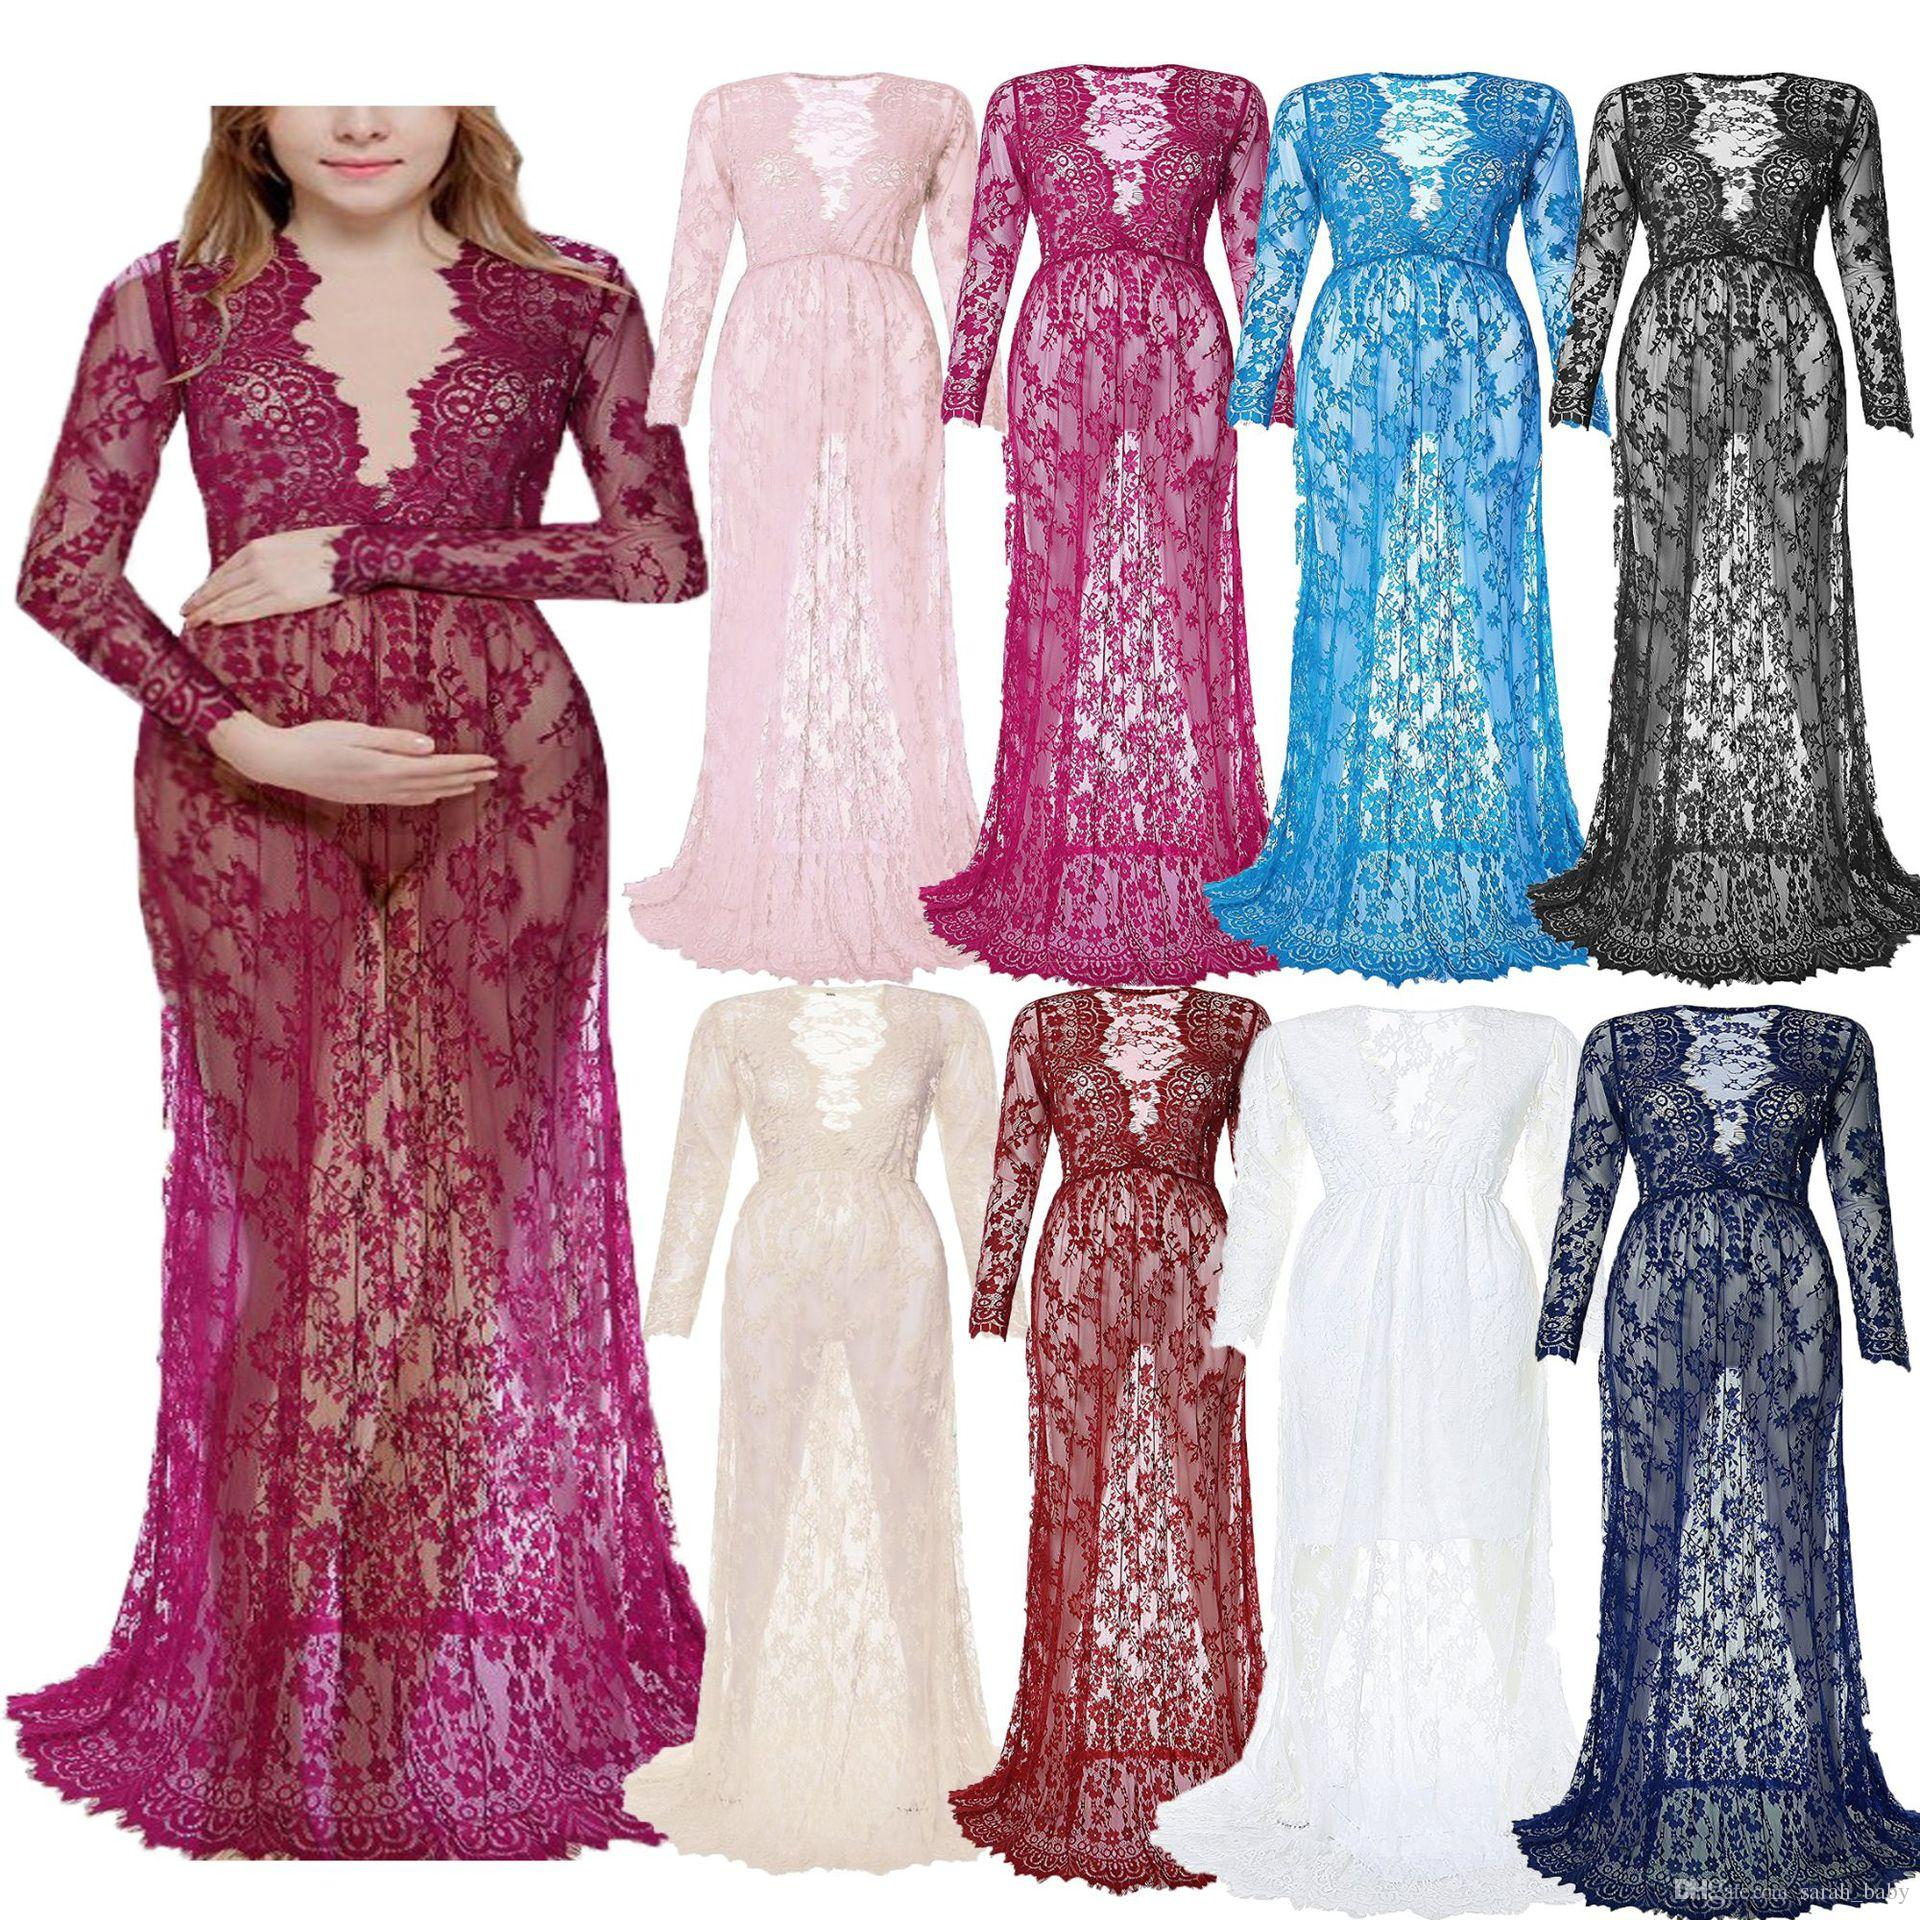 025ccb5efe965 Long Tight Maternity Dresses | Saddha